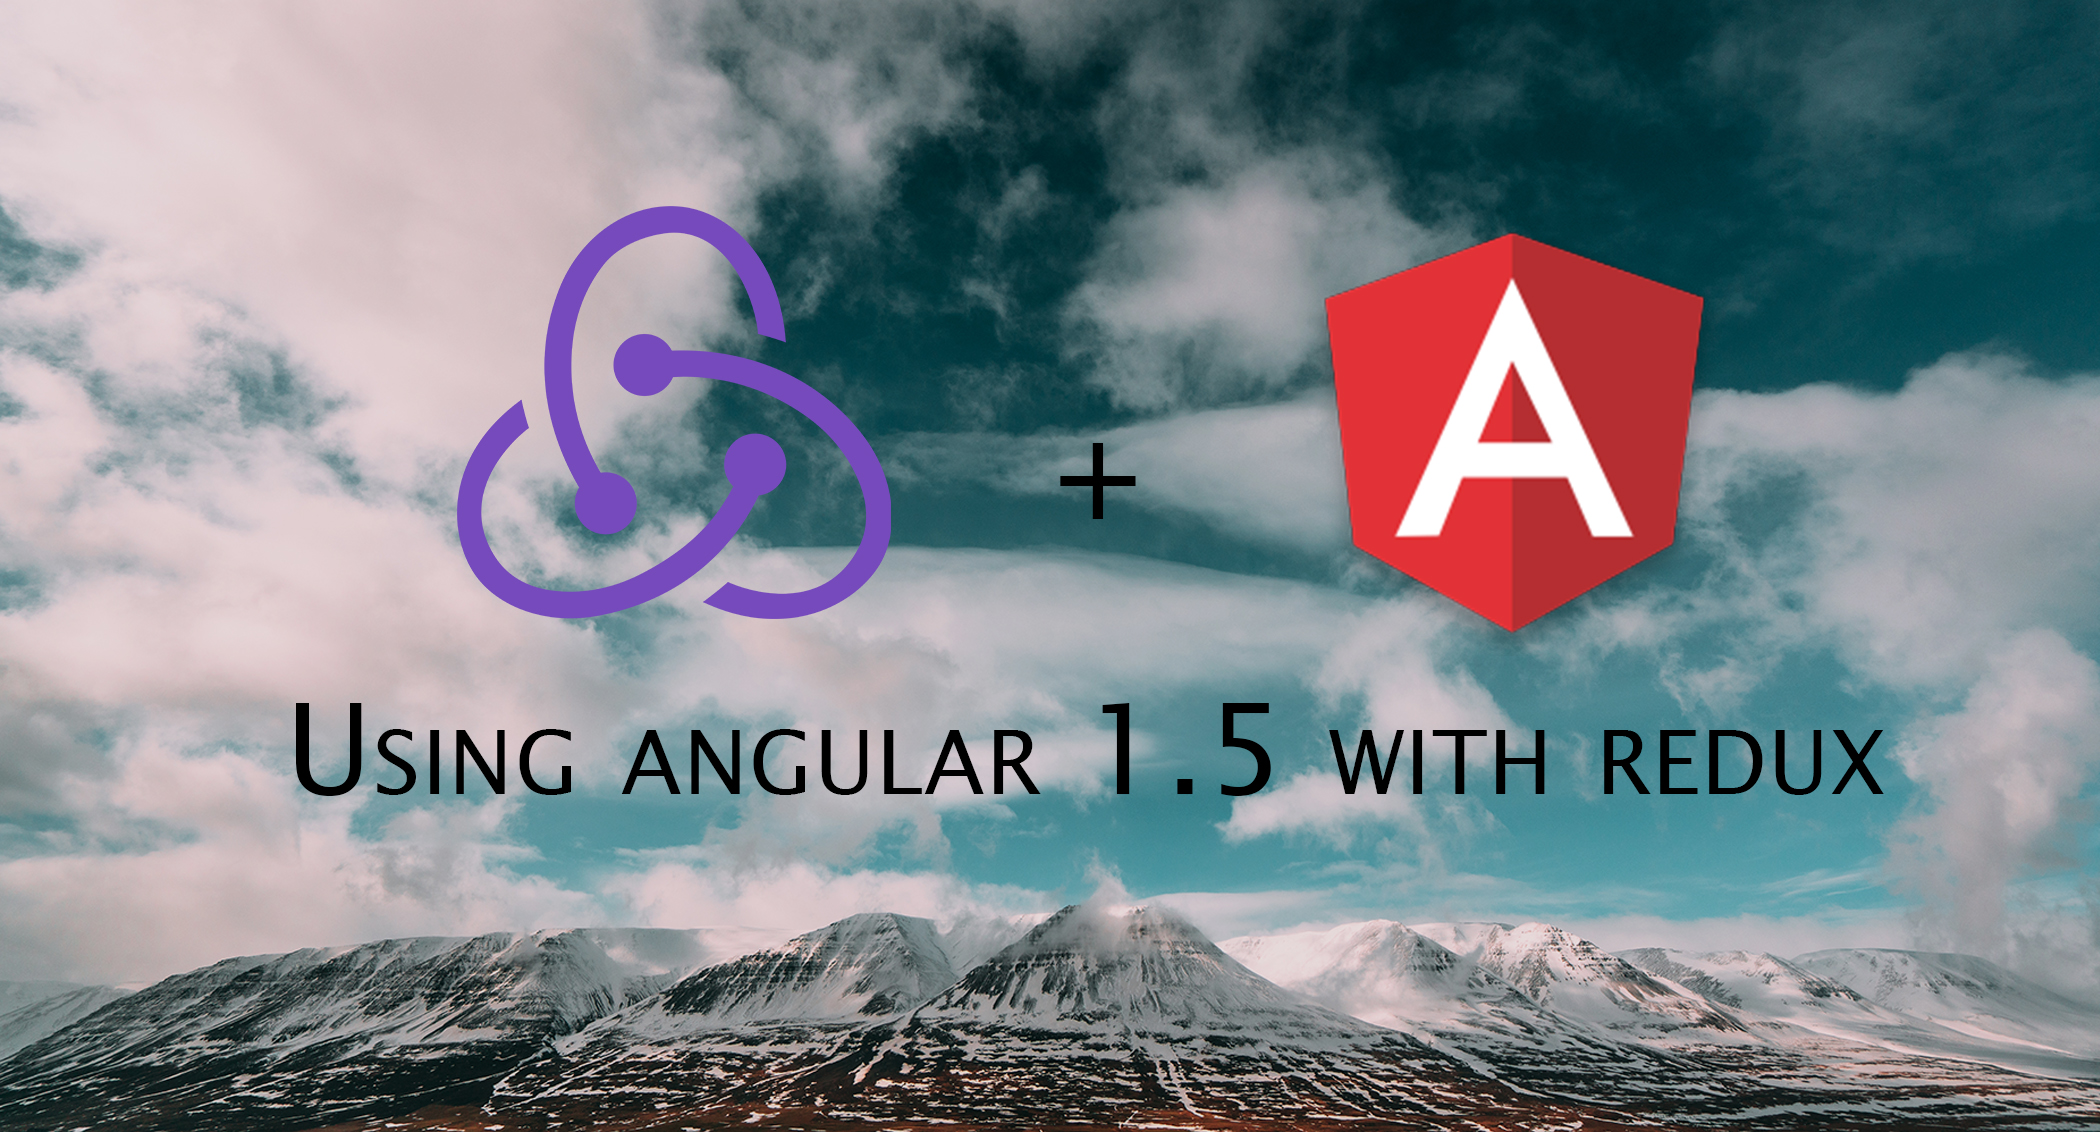 Angular 1 using redux architecture for Angular 1 architecture